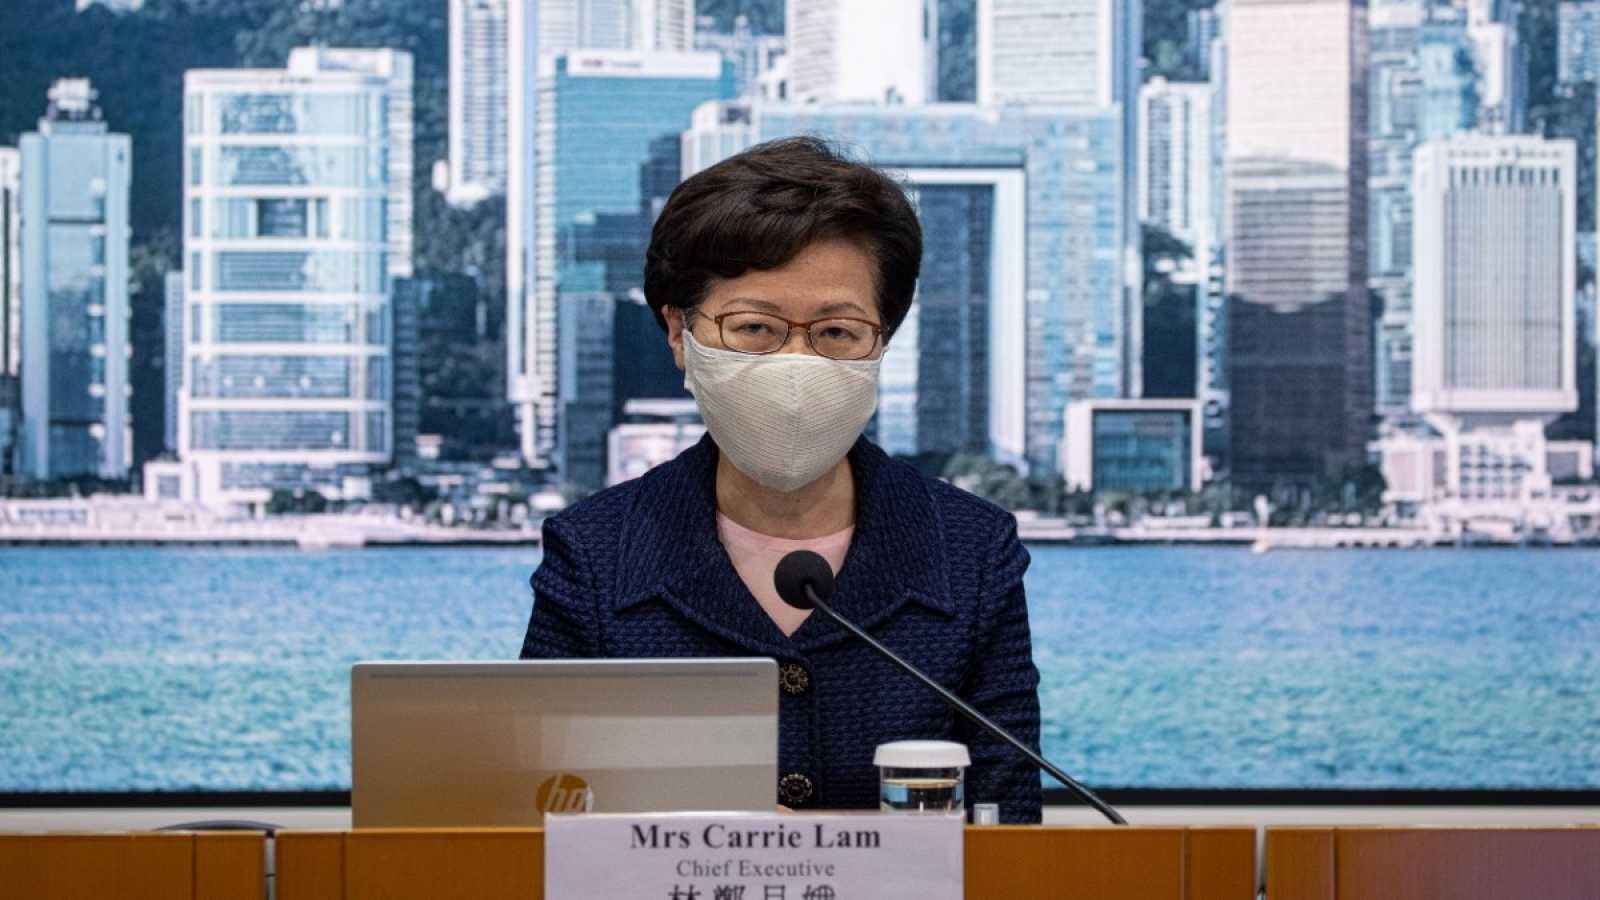 La líder del Ejecutivo de Hong Kong, Carrie Lam, durante una comparecencia